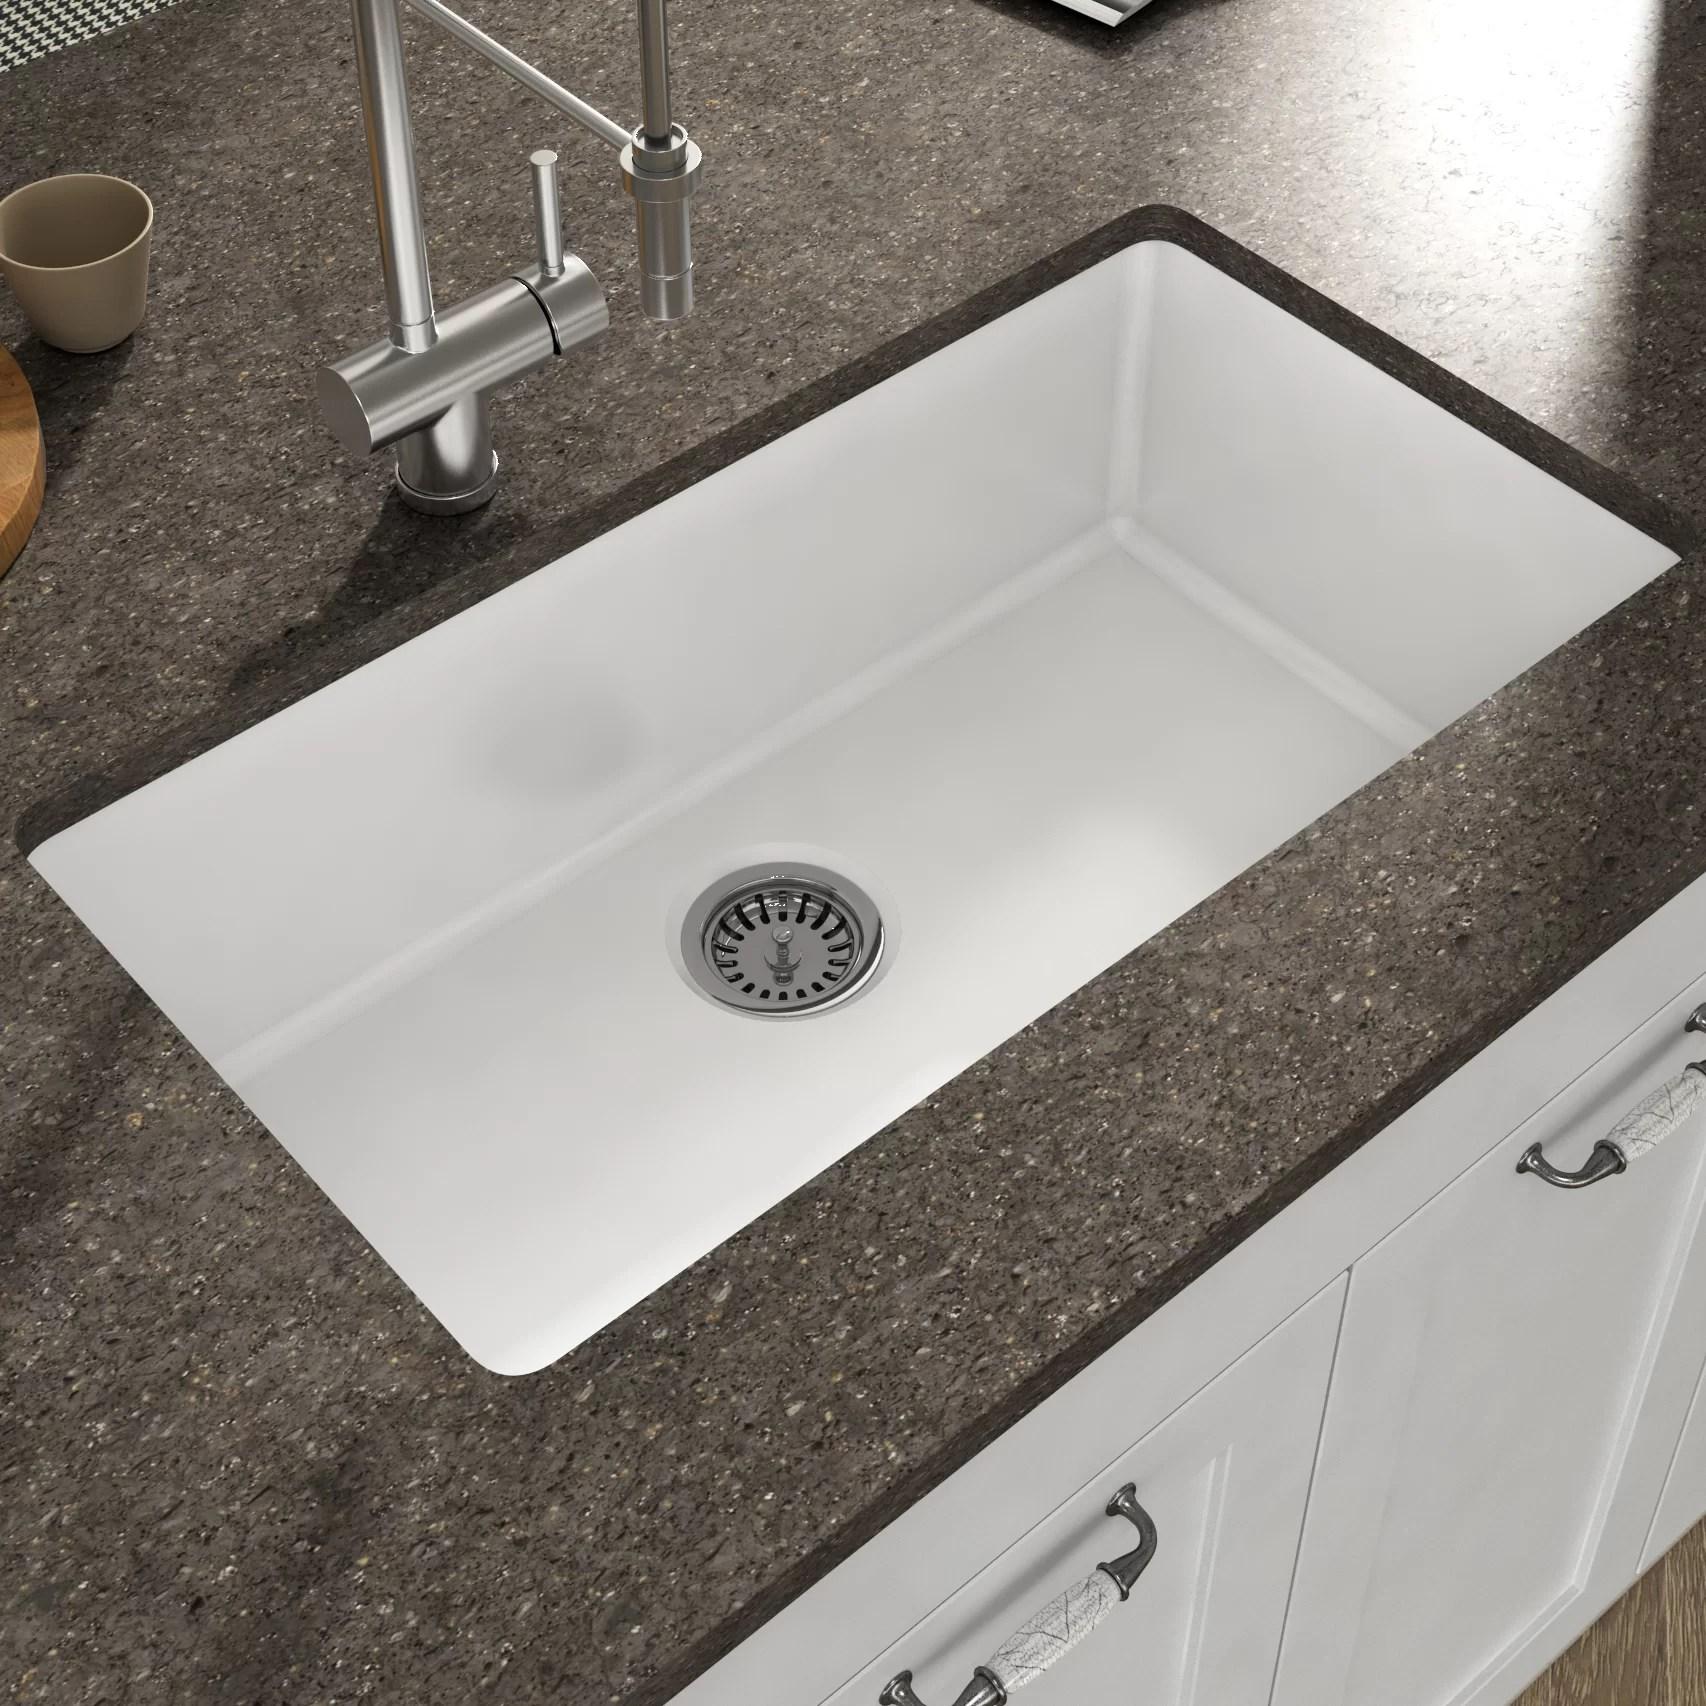 yorkshire 32 l x 18 w undermount kitchen sink with grid and strainer